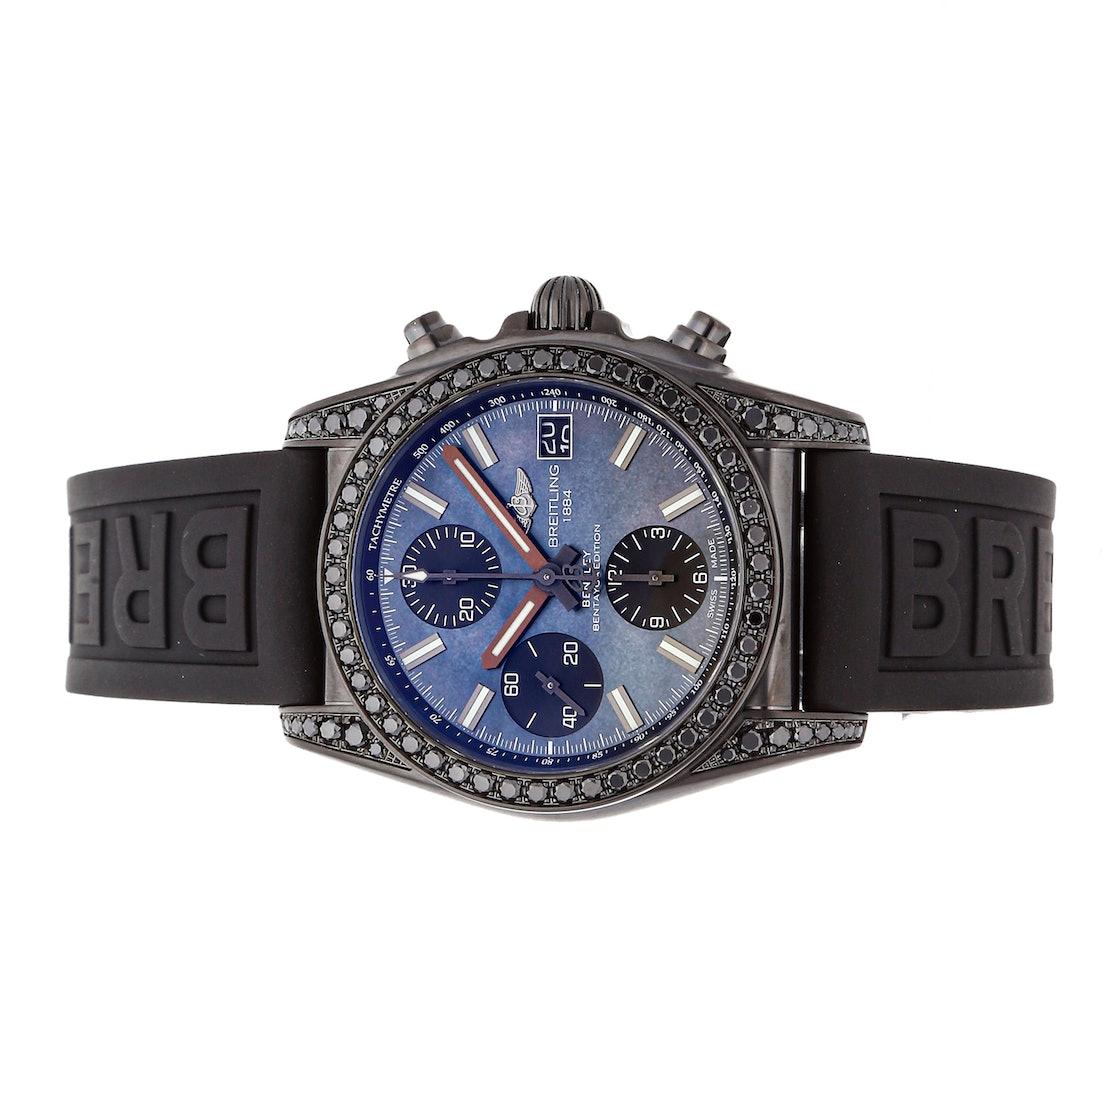 Breitling Chronomat Bentley Bentayga Edition M133102Z/BE70